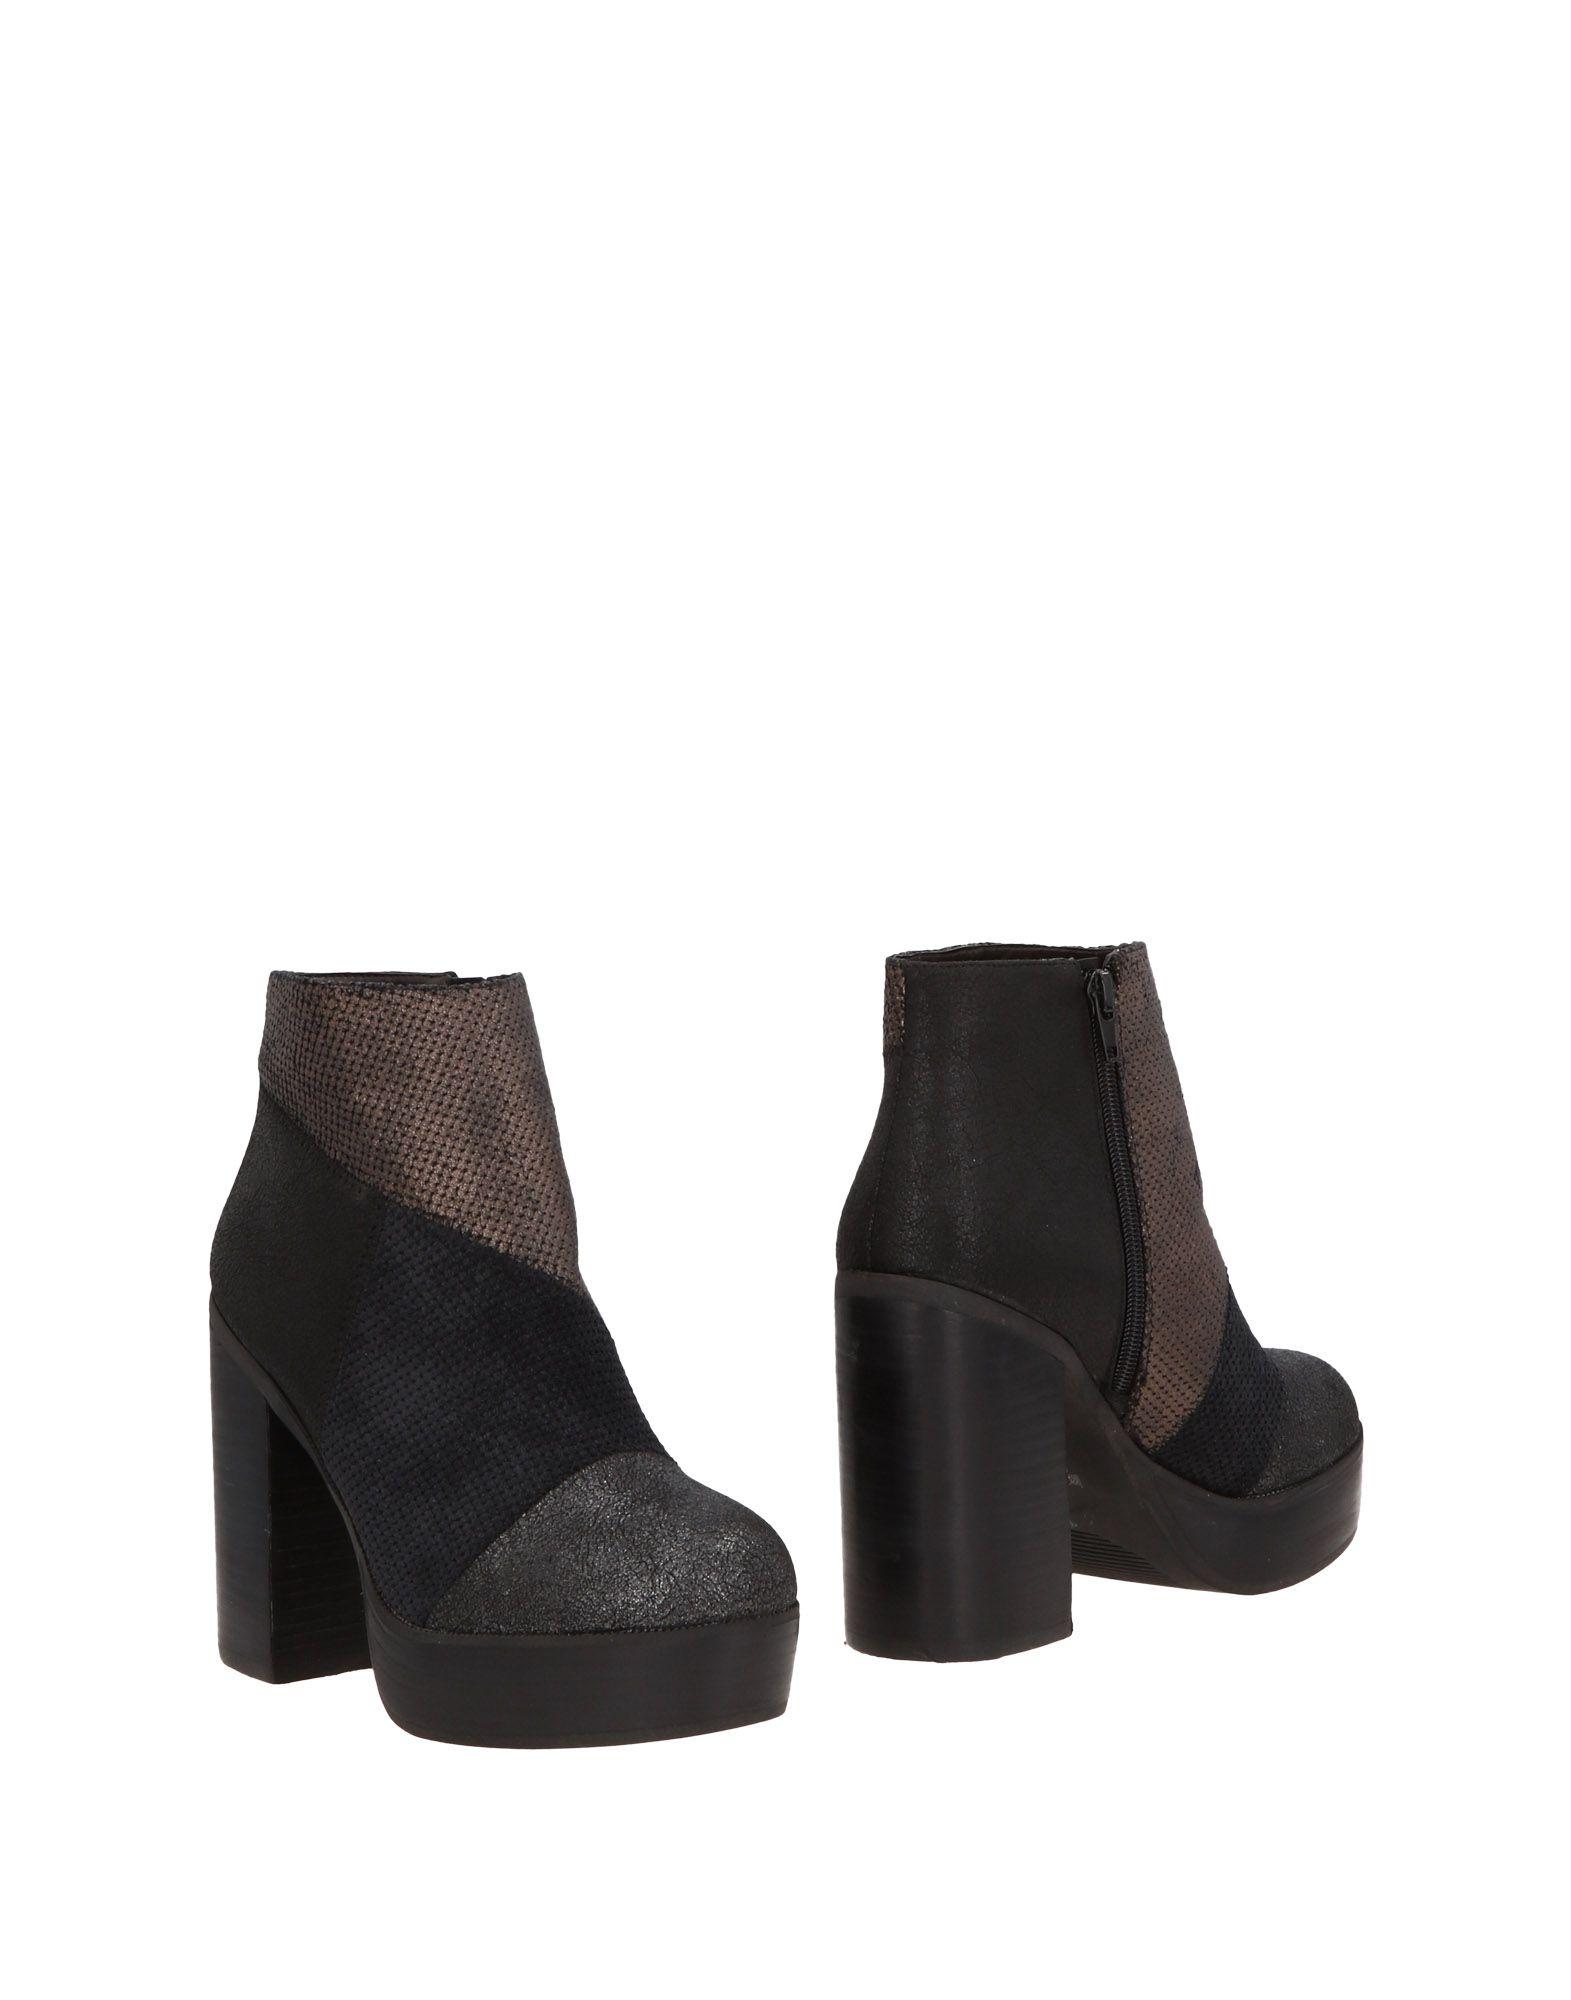 Police 11475586VX 883 Stiefelette Damen  11475586VX Police Gute Qualität beliebte Schuhe e93d73